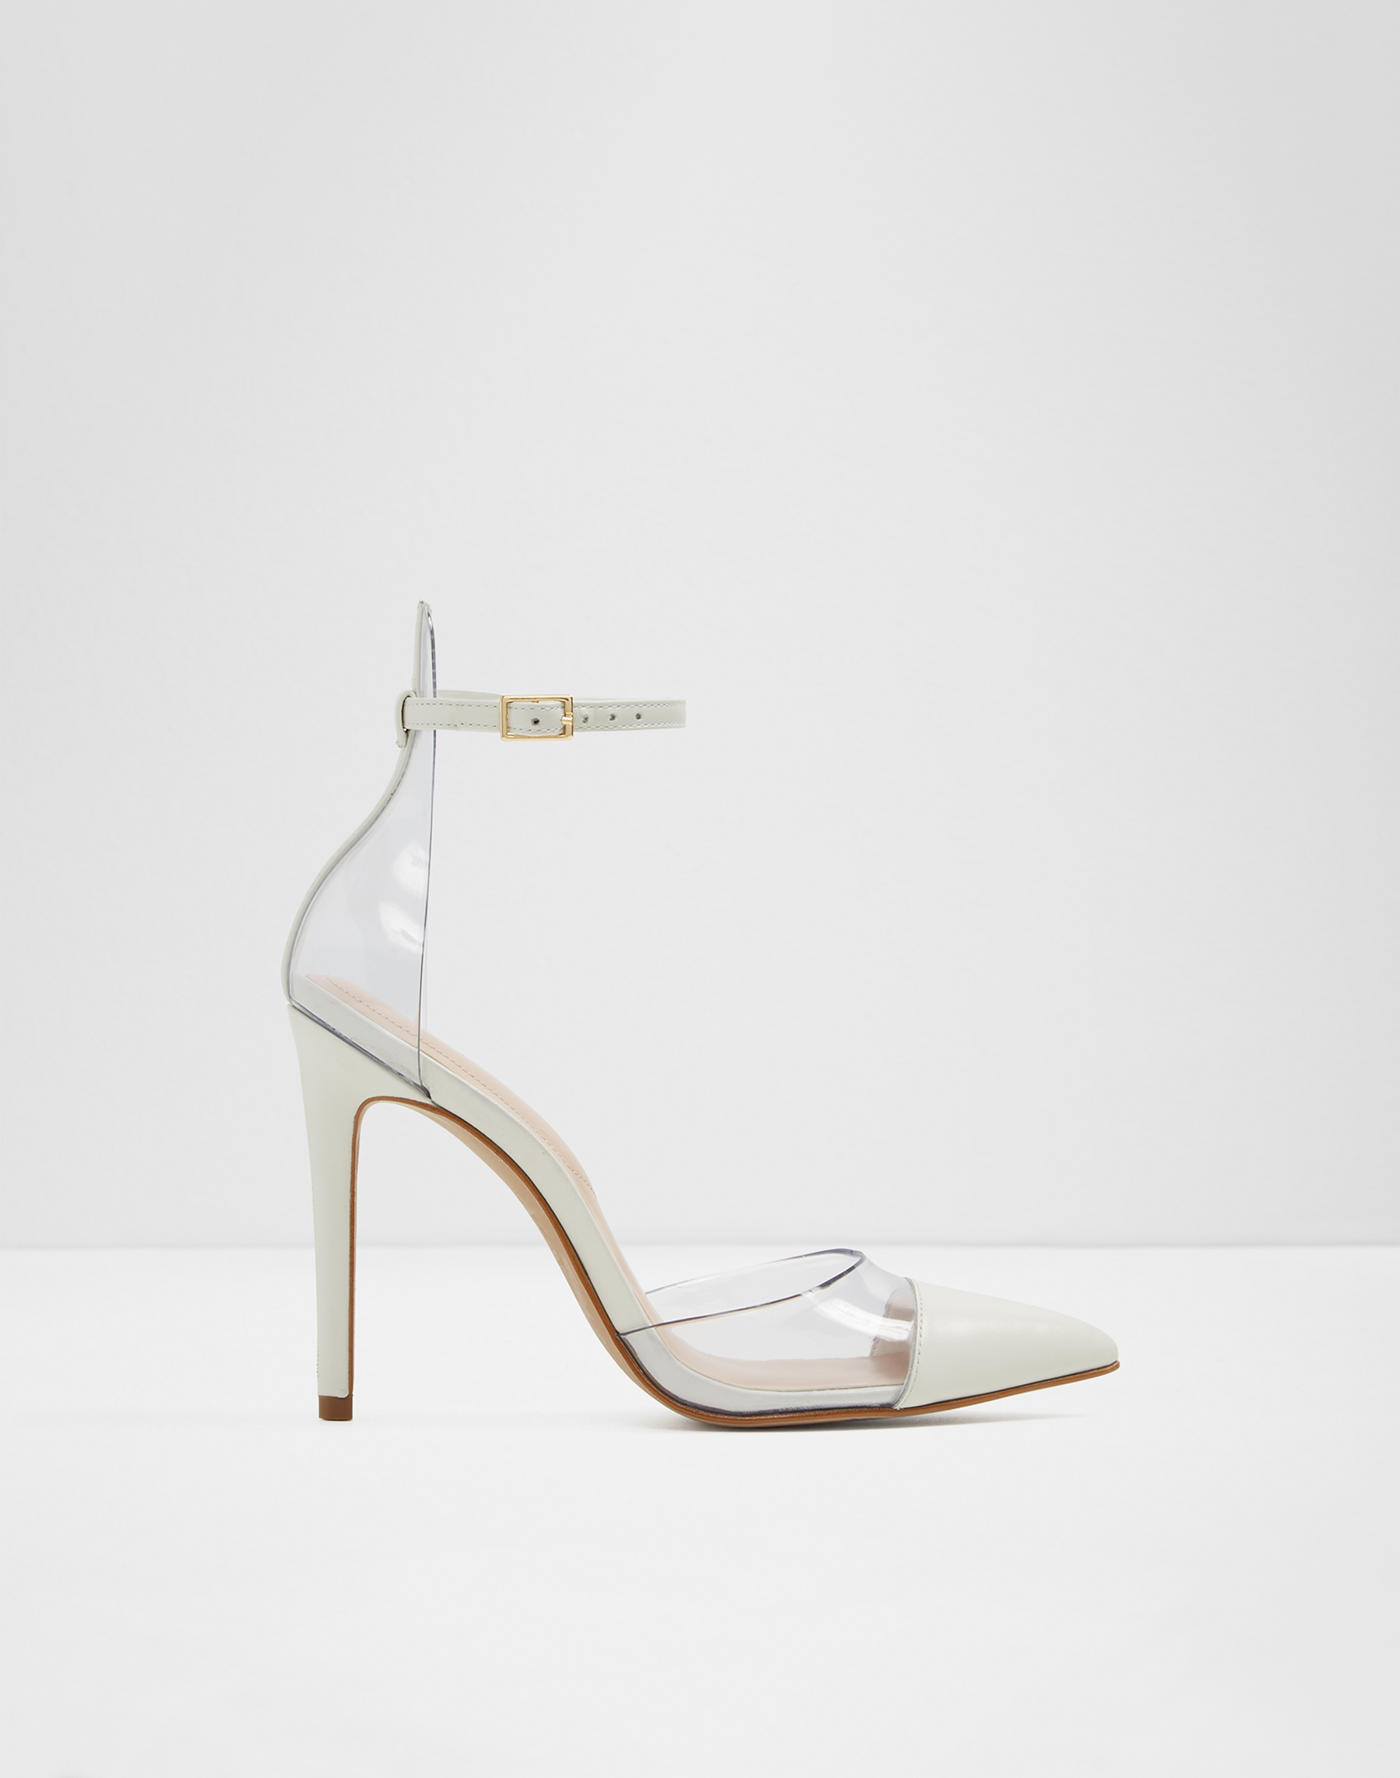 553e8718d628 Women's Heels | Black, Red, Nude, Silver Heels | ALDO US | Aldoshoes.com US